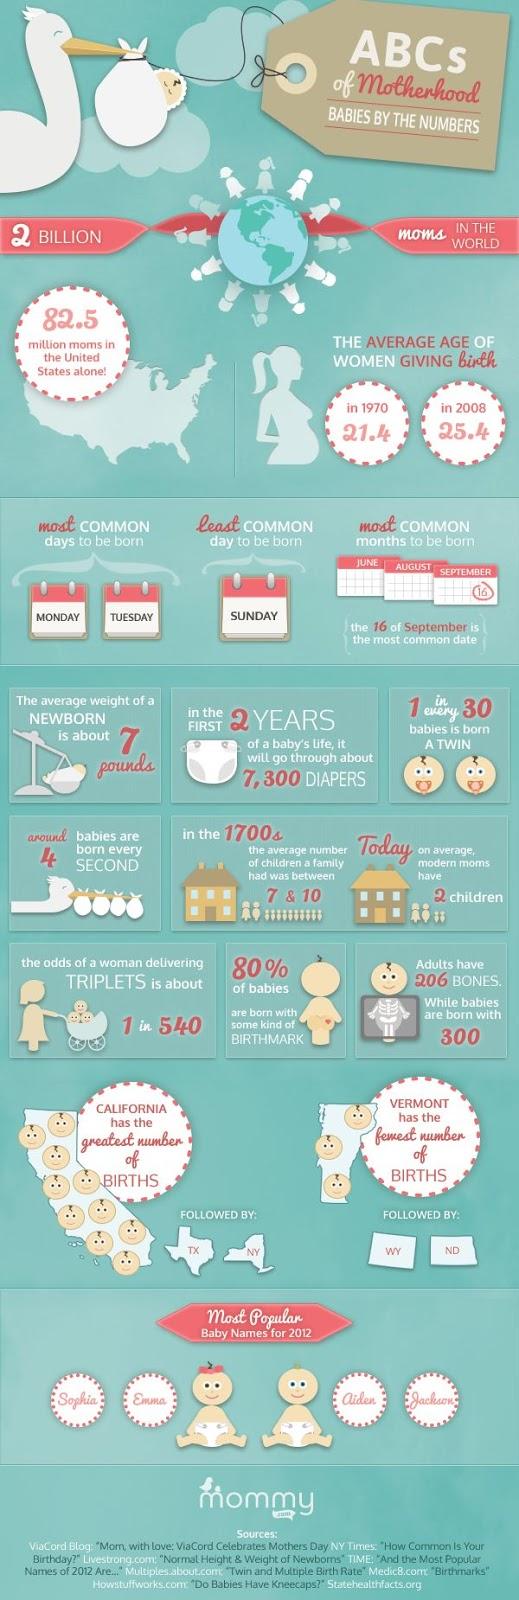 The ABCs of Motherhood Infographic